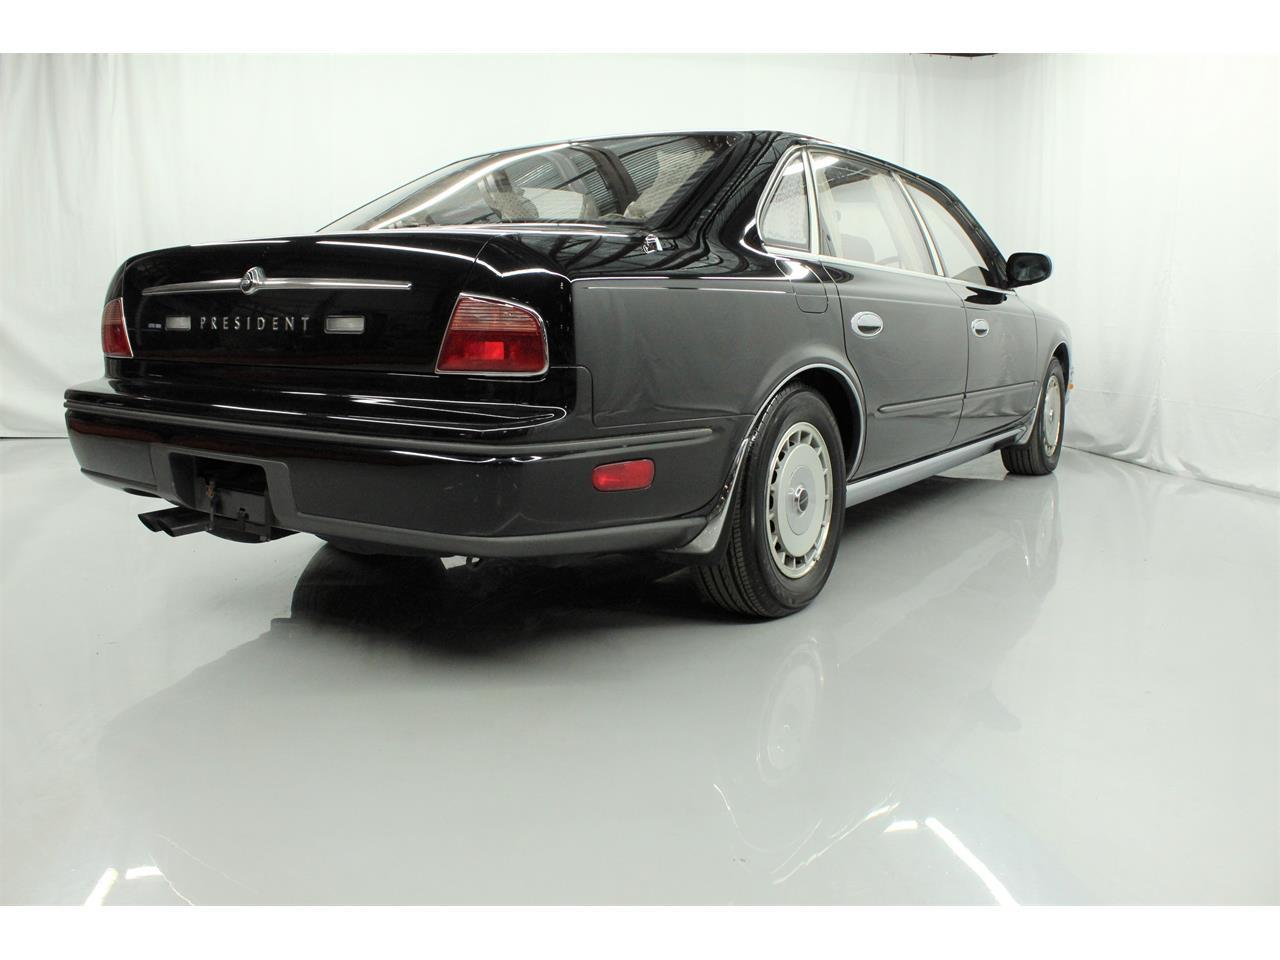 1992 Nissan President (CC-1319207) for sale in Christiansburg, Virginia